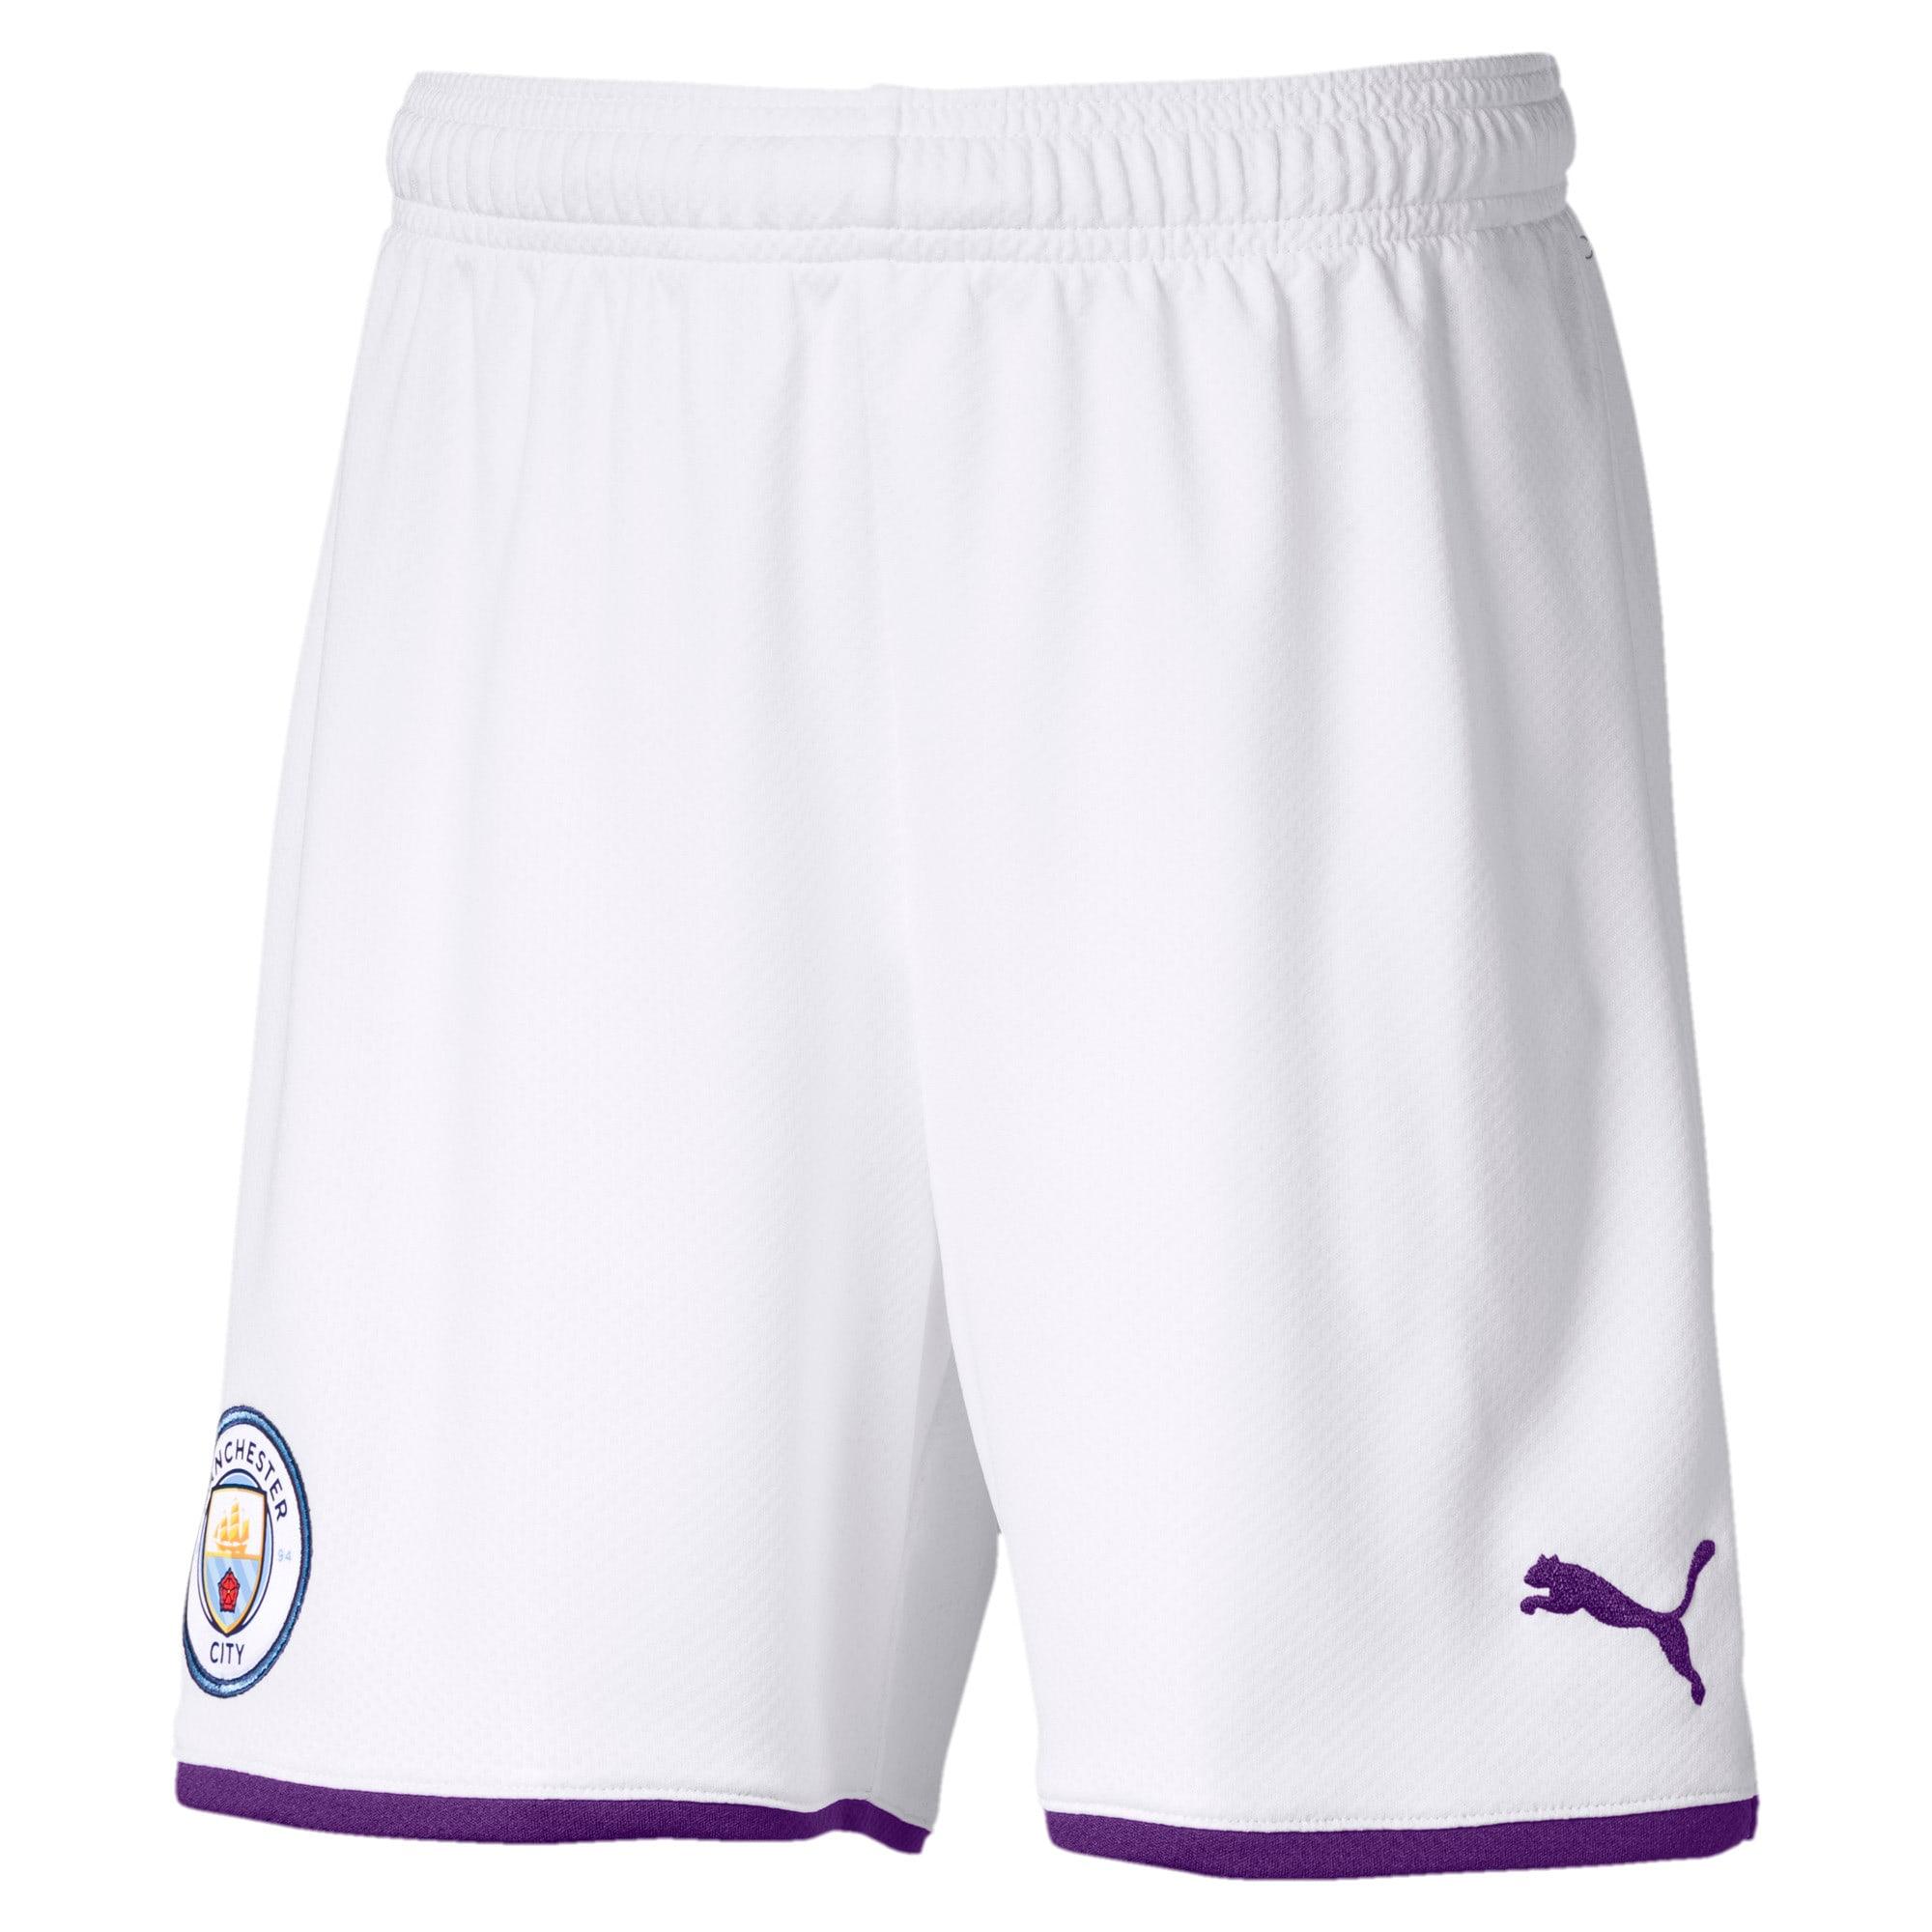 Thumbnail 1 of Manchester City FC Kids' Third Replica Shorts, Puma White-Tillandsia Purple, medium